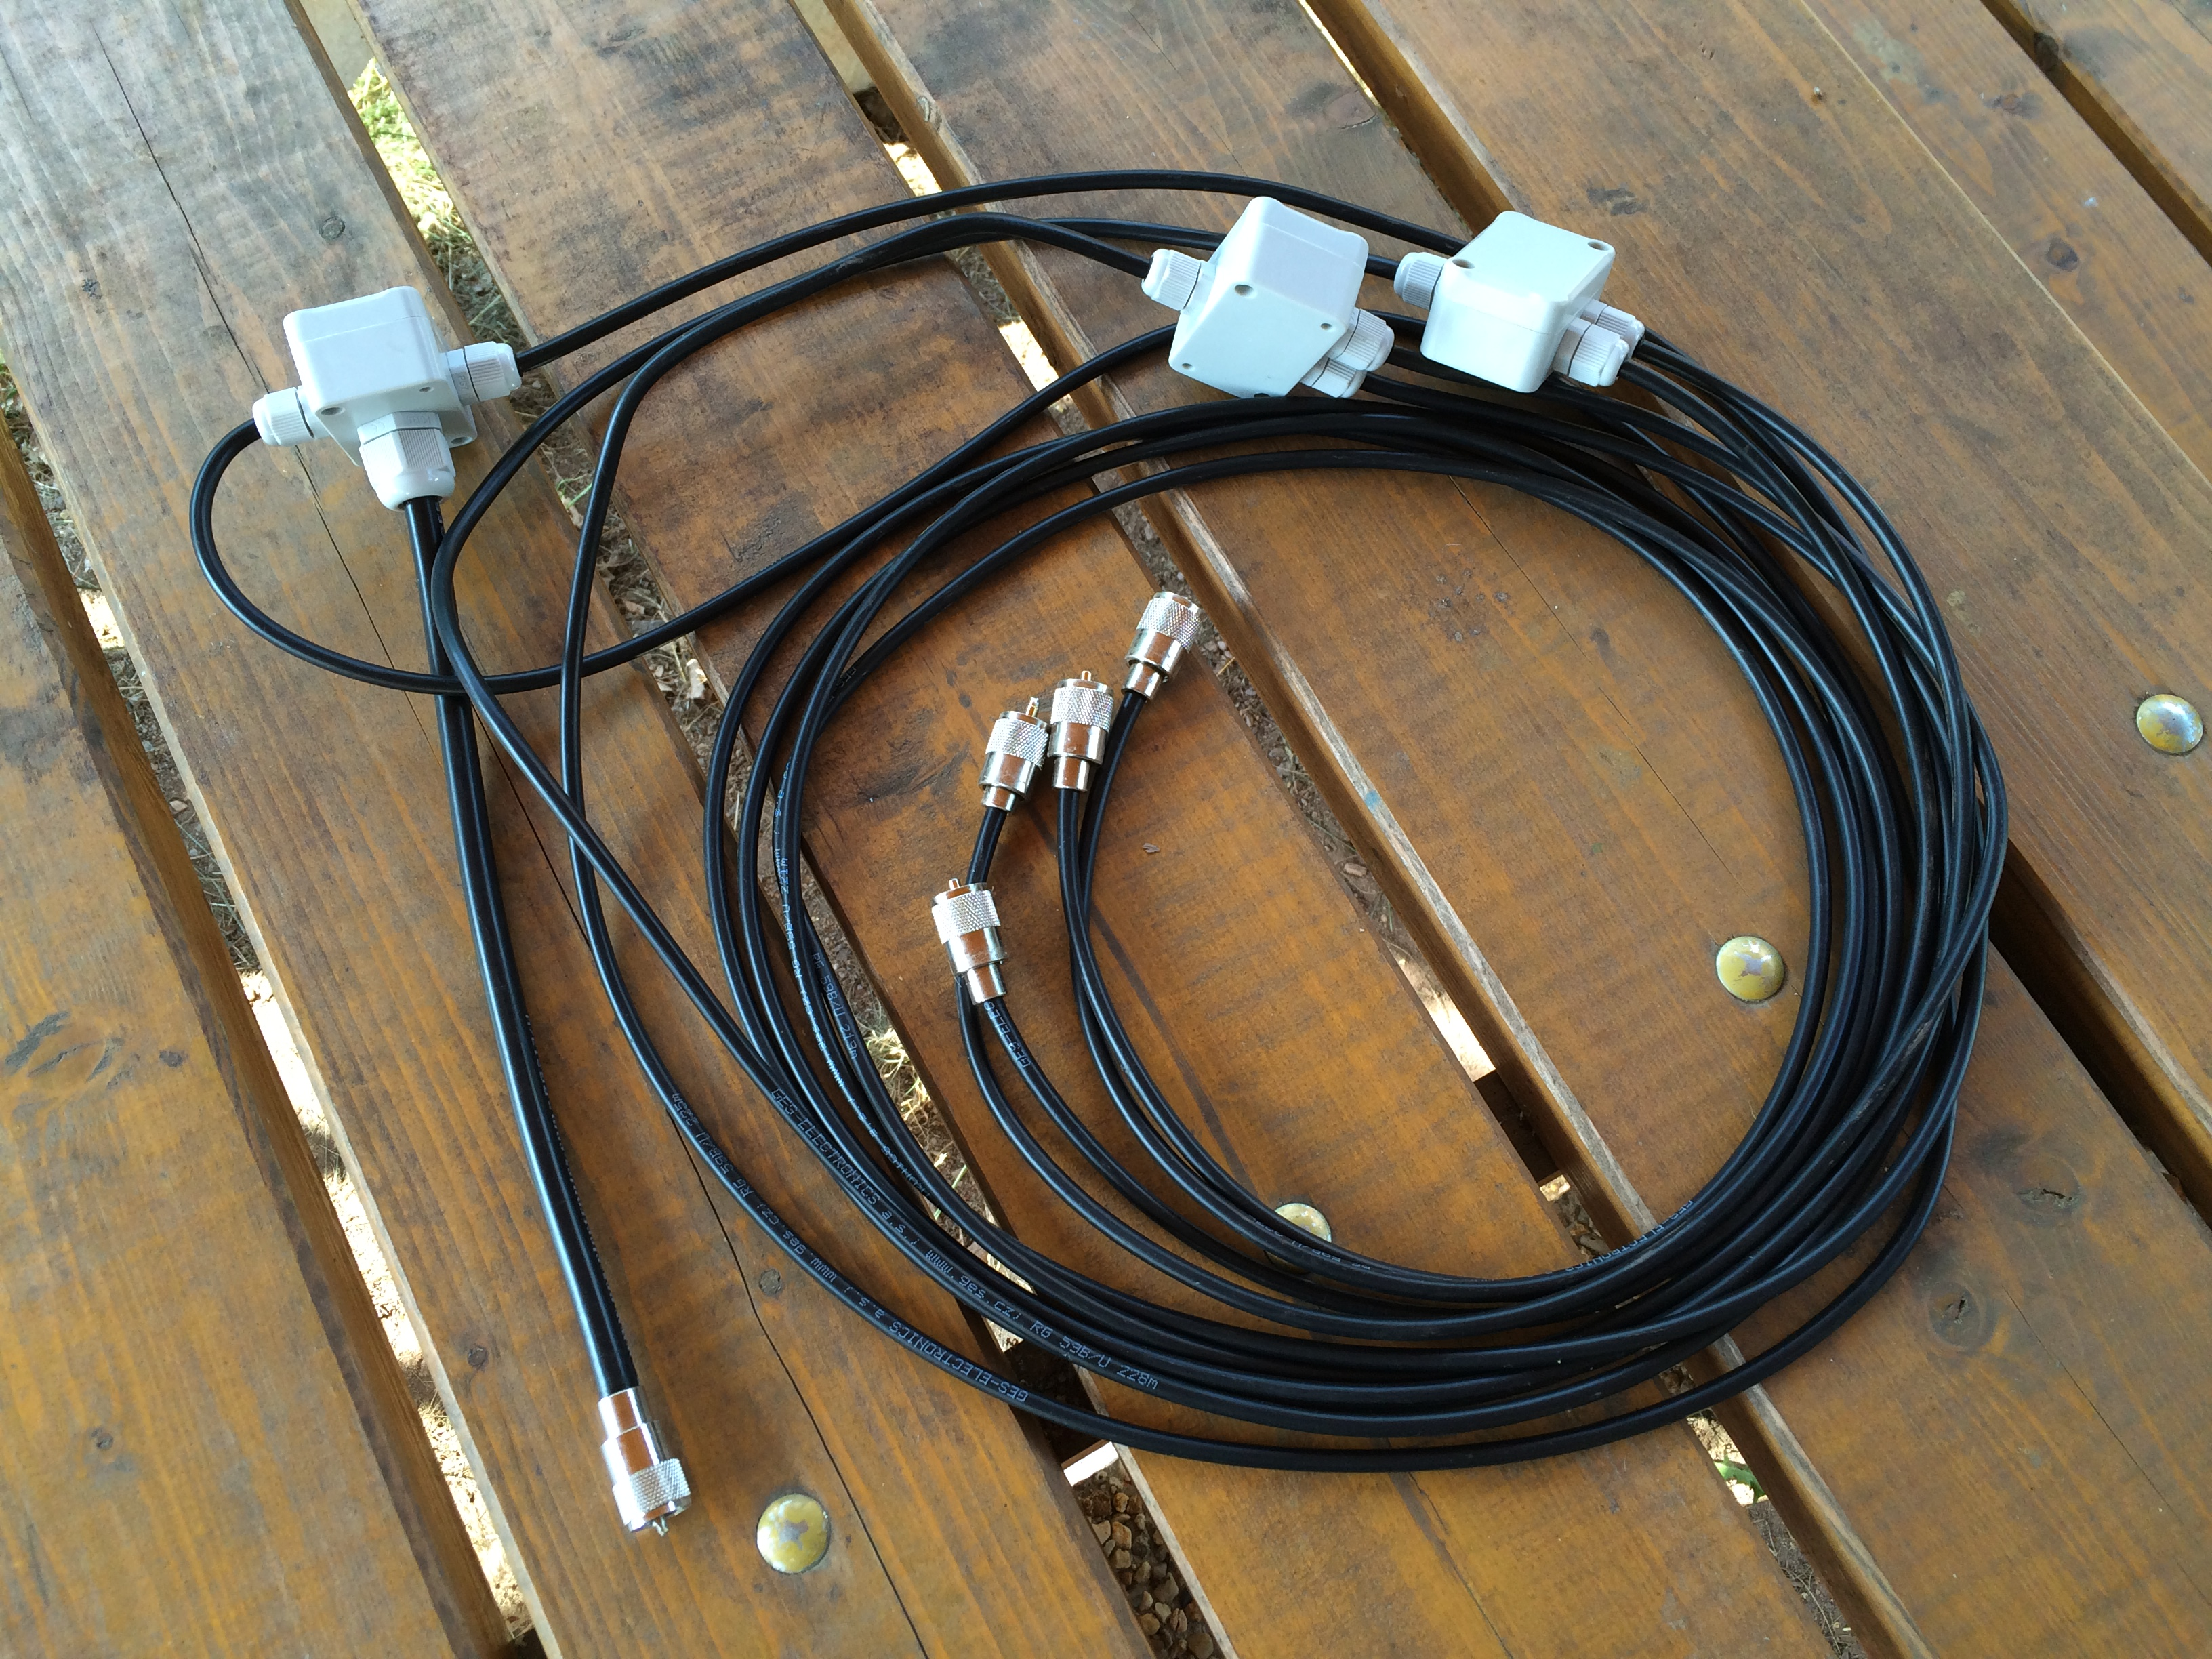 Antenna DK7ZB 4x4ele for 144 MHz